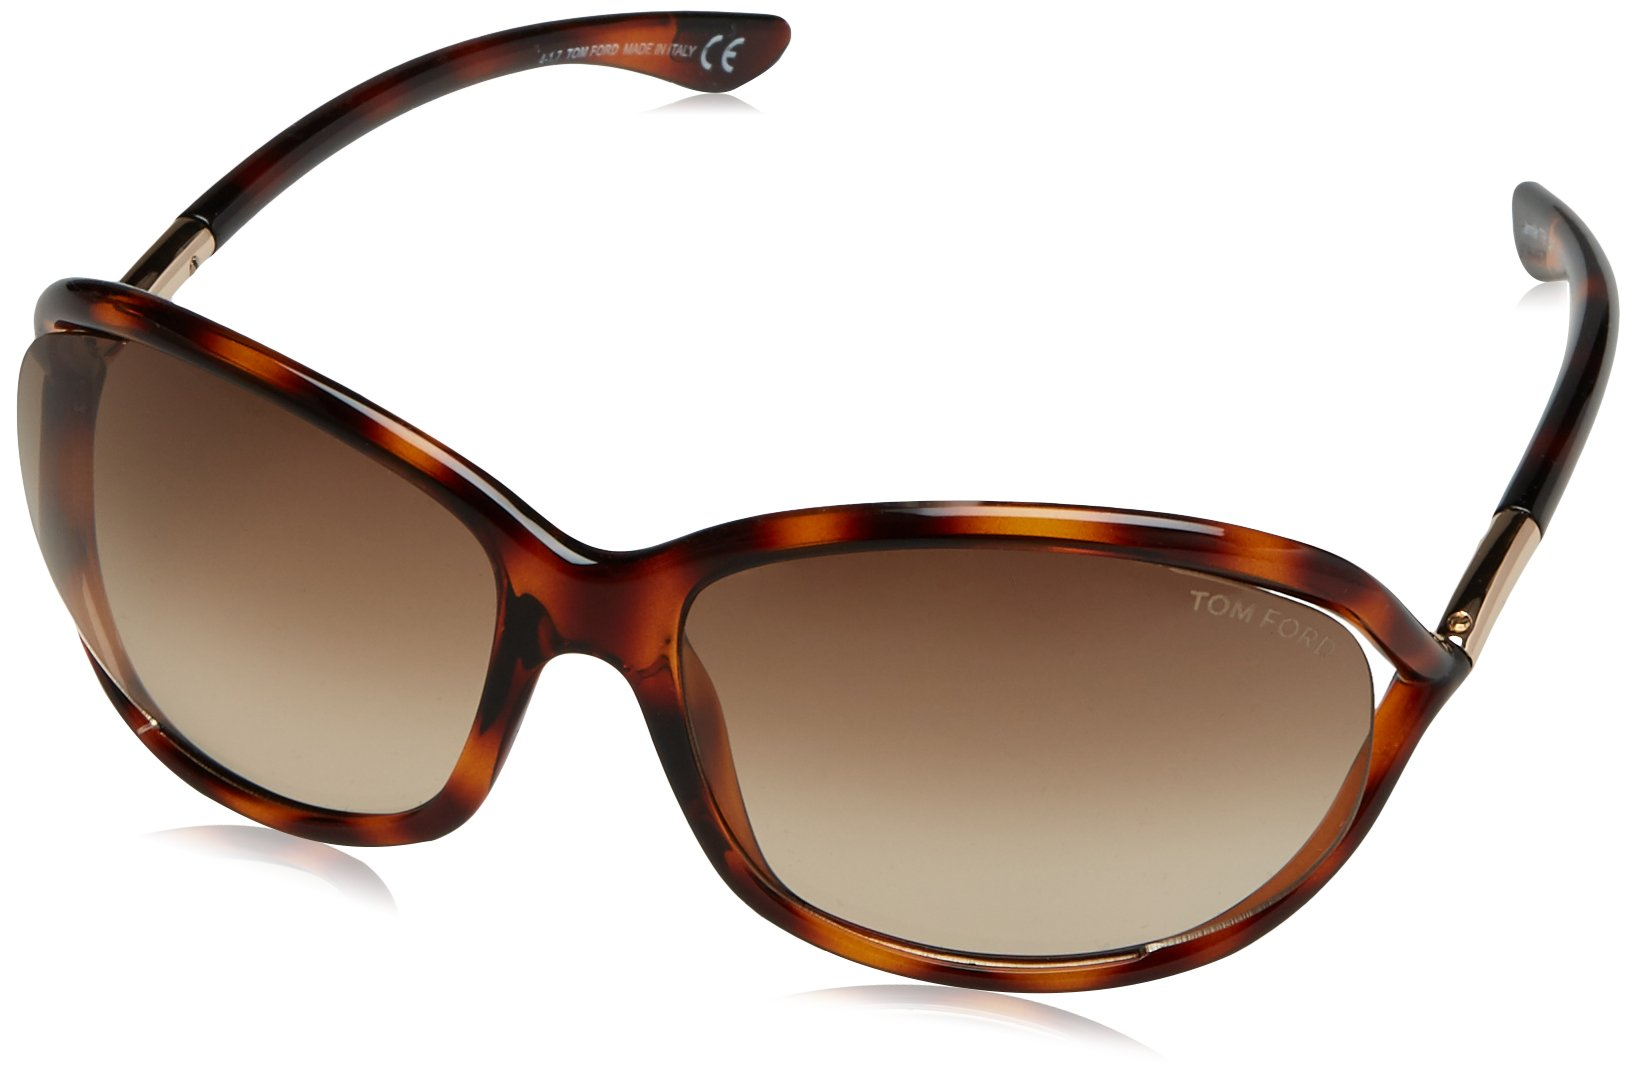 Tom Ford Jennifer FT 0008 sunglasses Shiny Black/ Rose Gold Metal & Smoke Gradient (Grey) lens